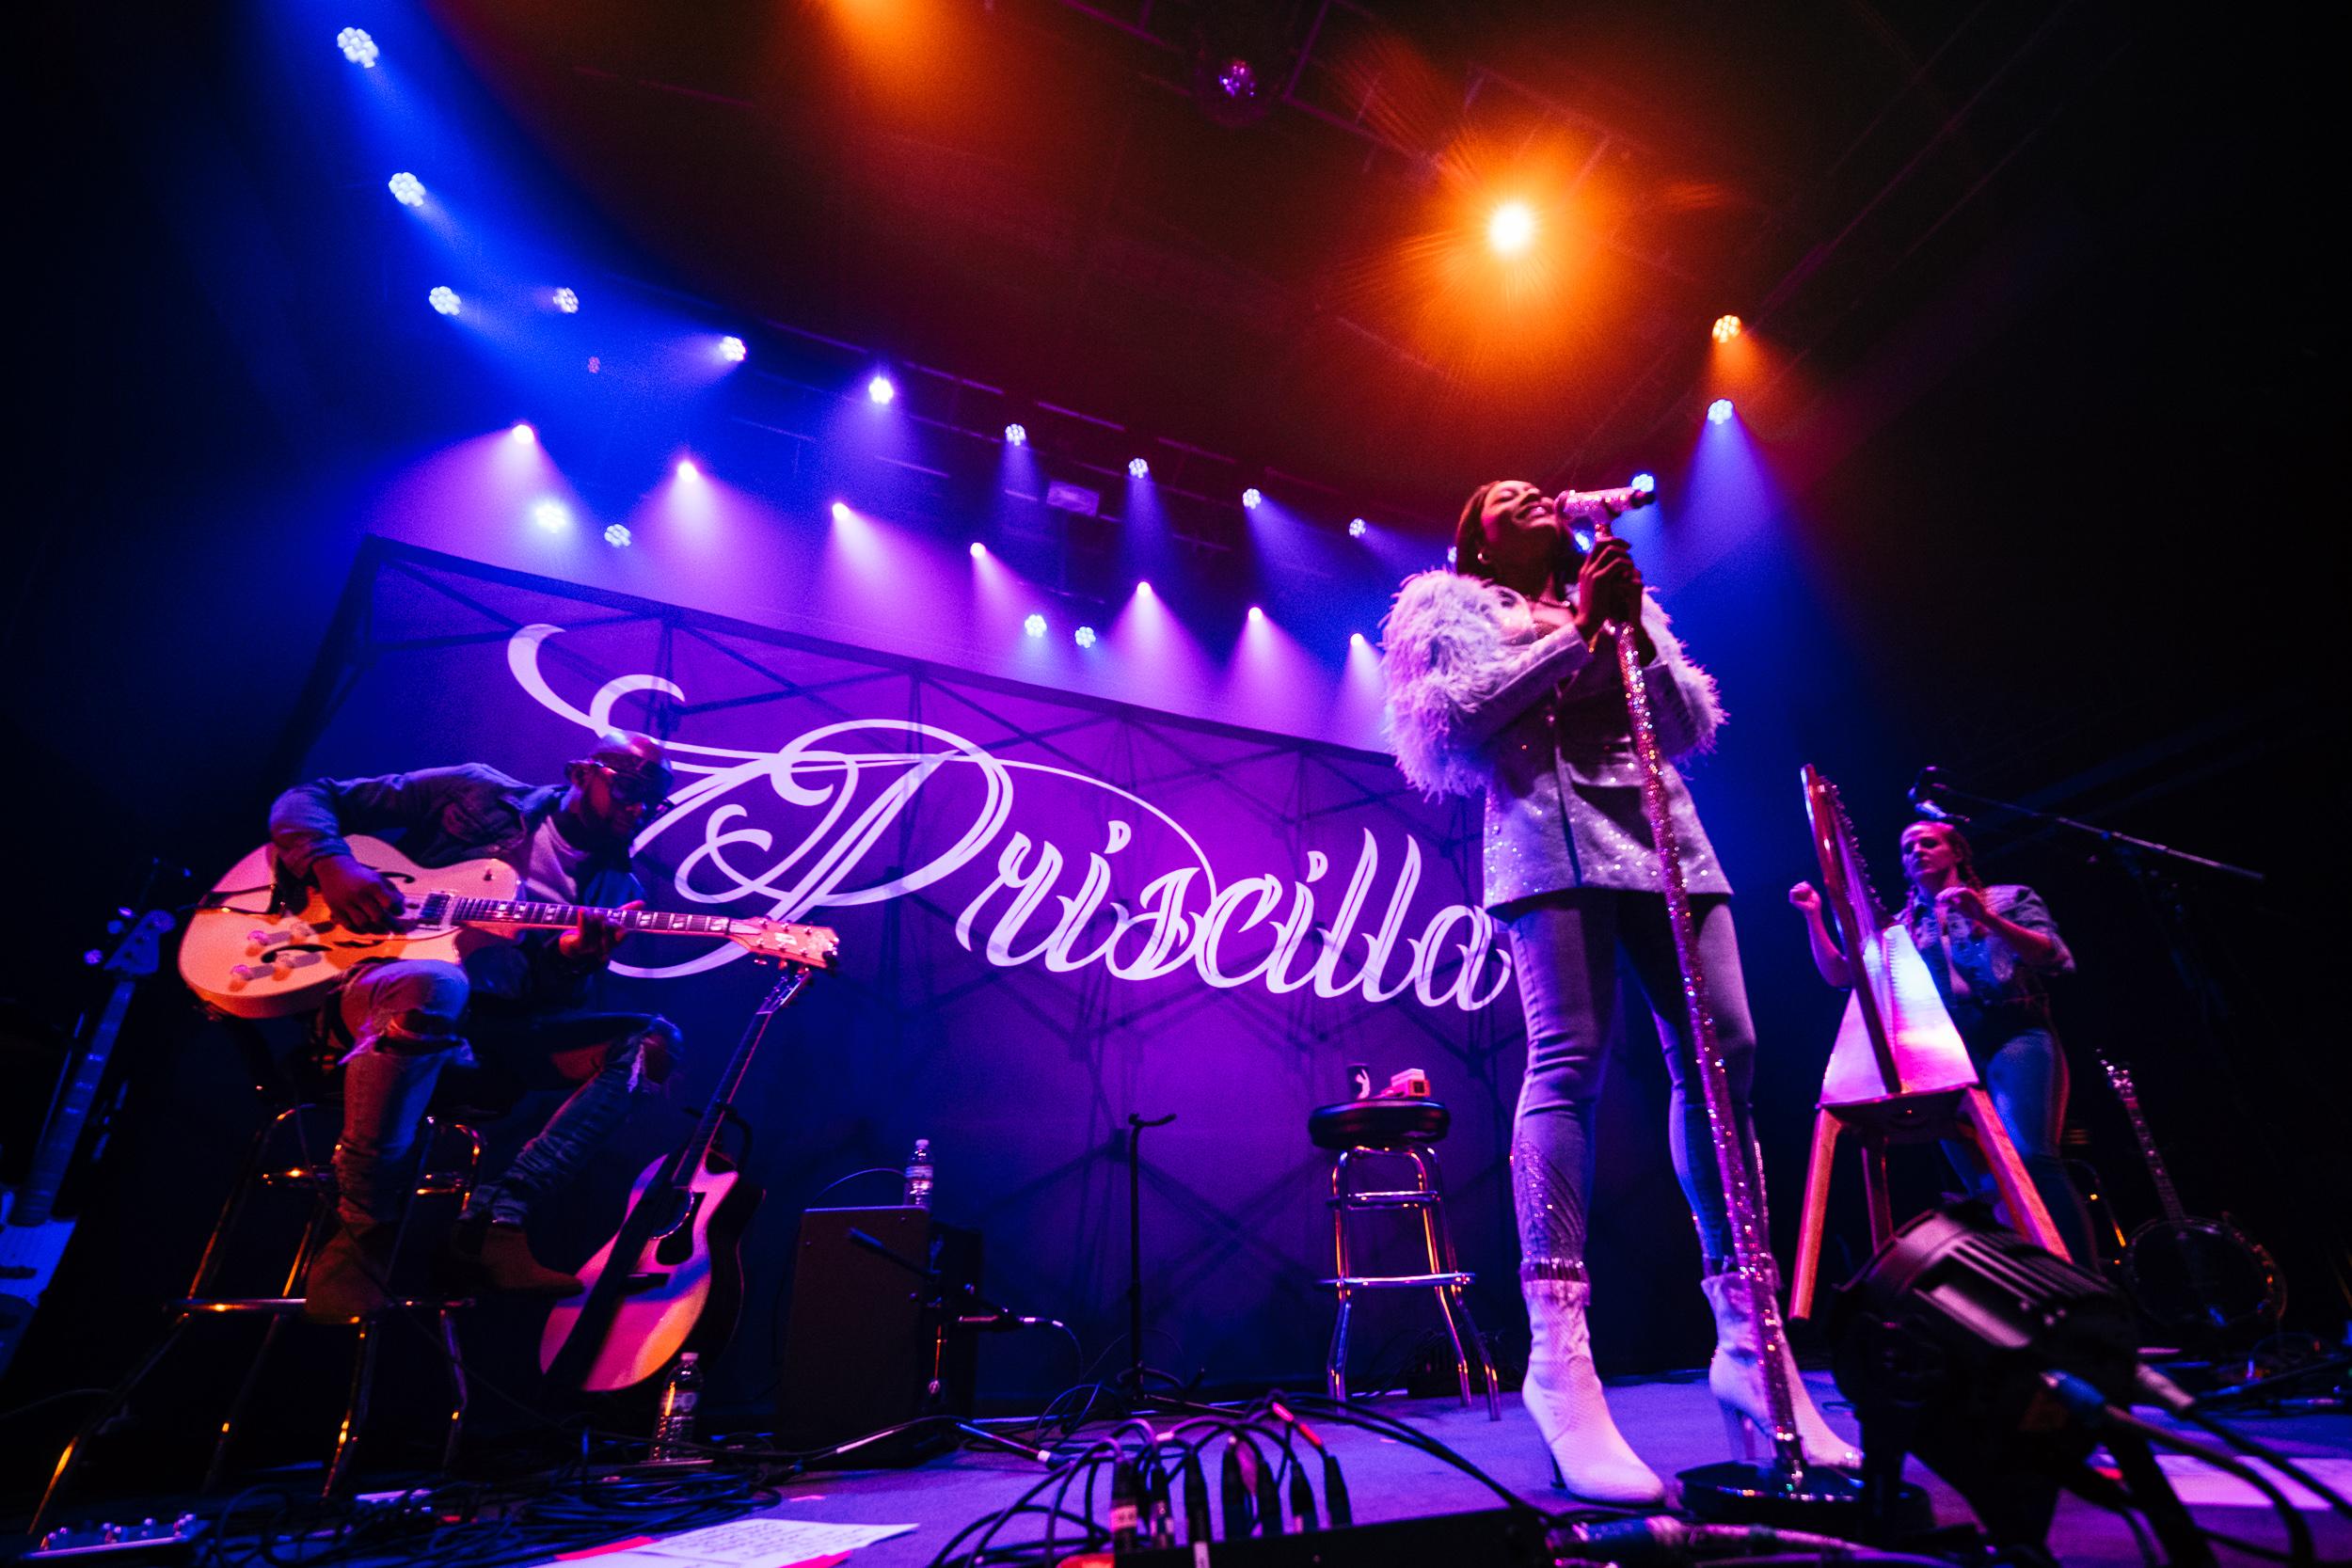 Priscilla Renea at 9:30 Club (Photo by Joel Richard)